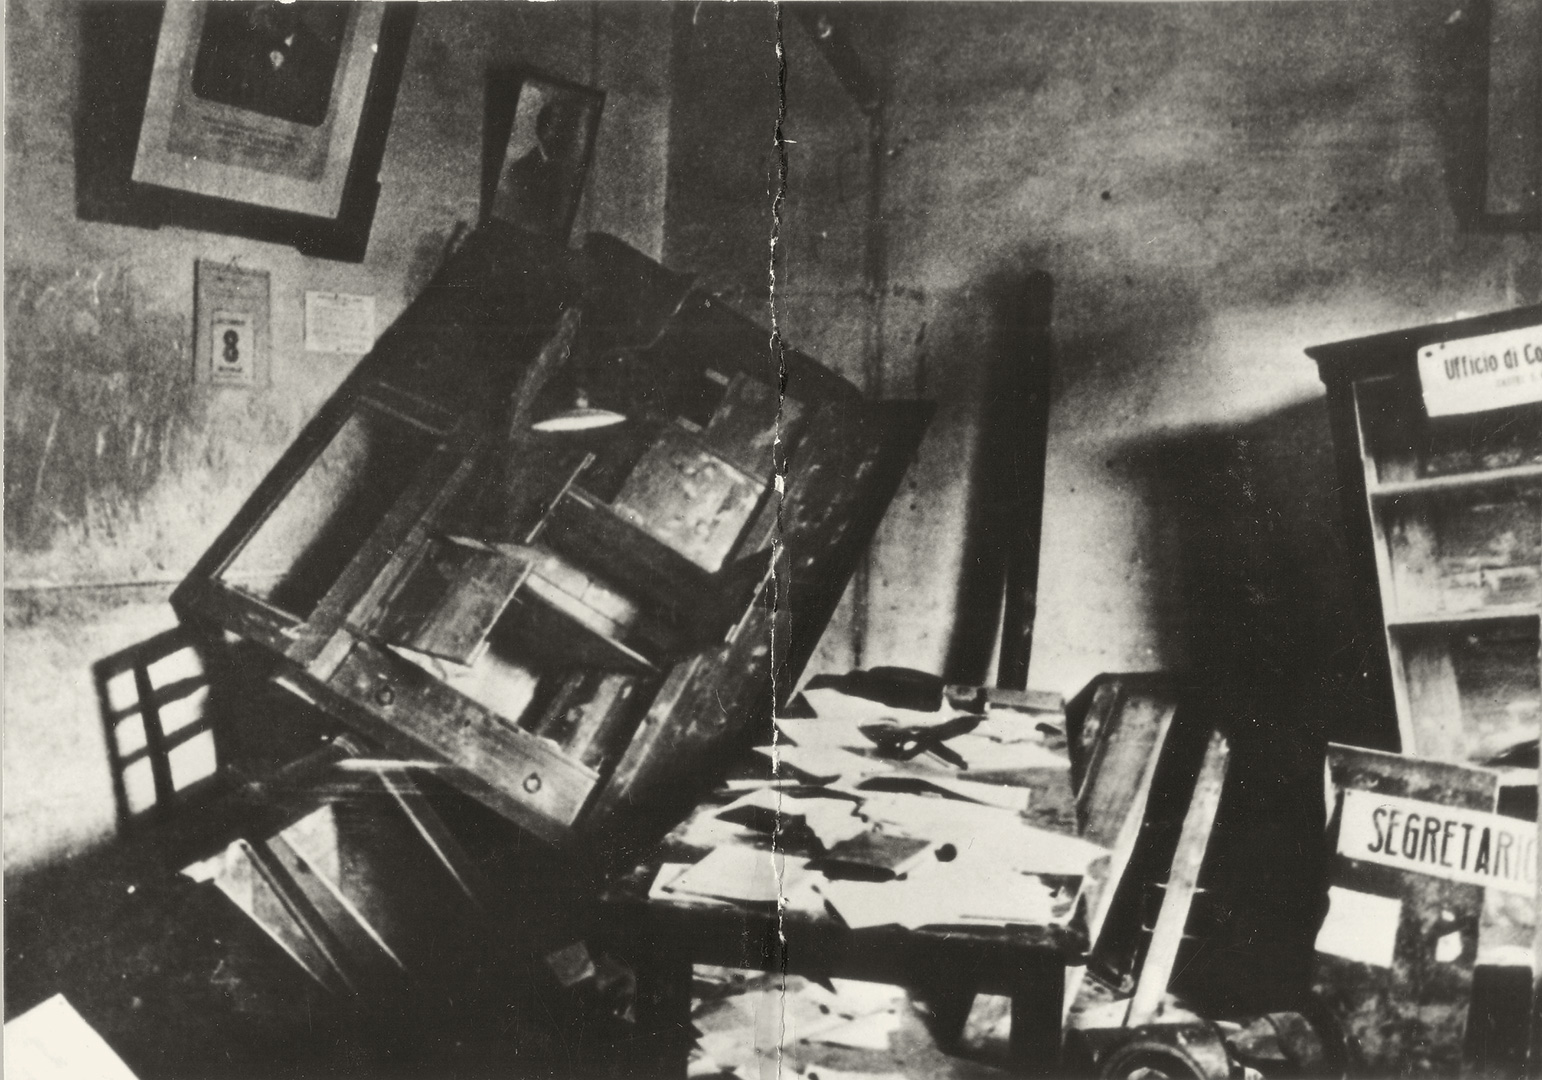 3. Castel San Pietro, 1921, Sede sindacale di Castel San Pietro devastata dalle squadre fasciste (Archivio Cidra)